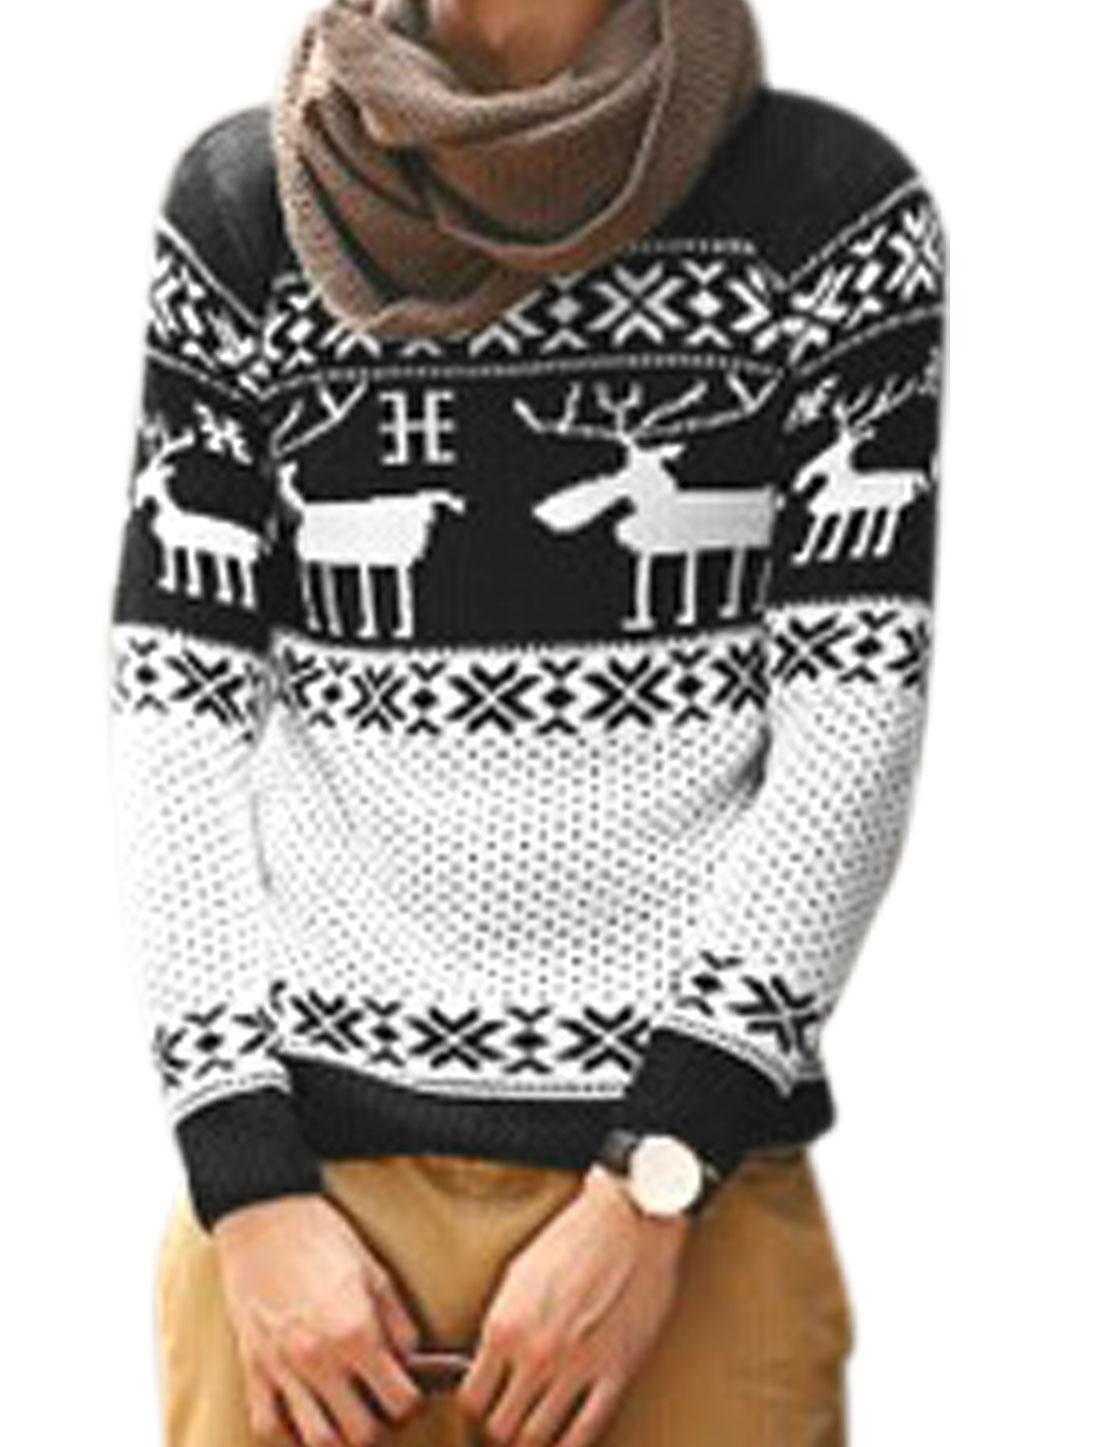 Men Leisure Deer Pattern Snowflake Pattern Contrast Color Sweater Black White S